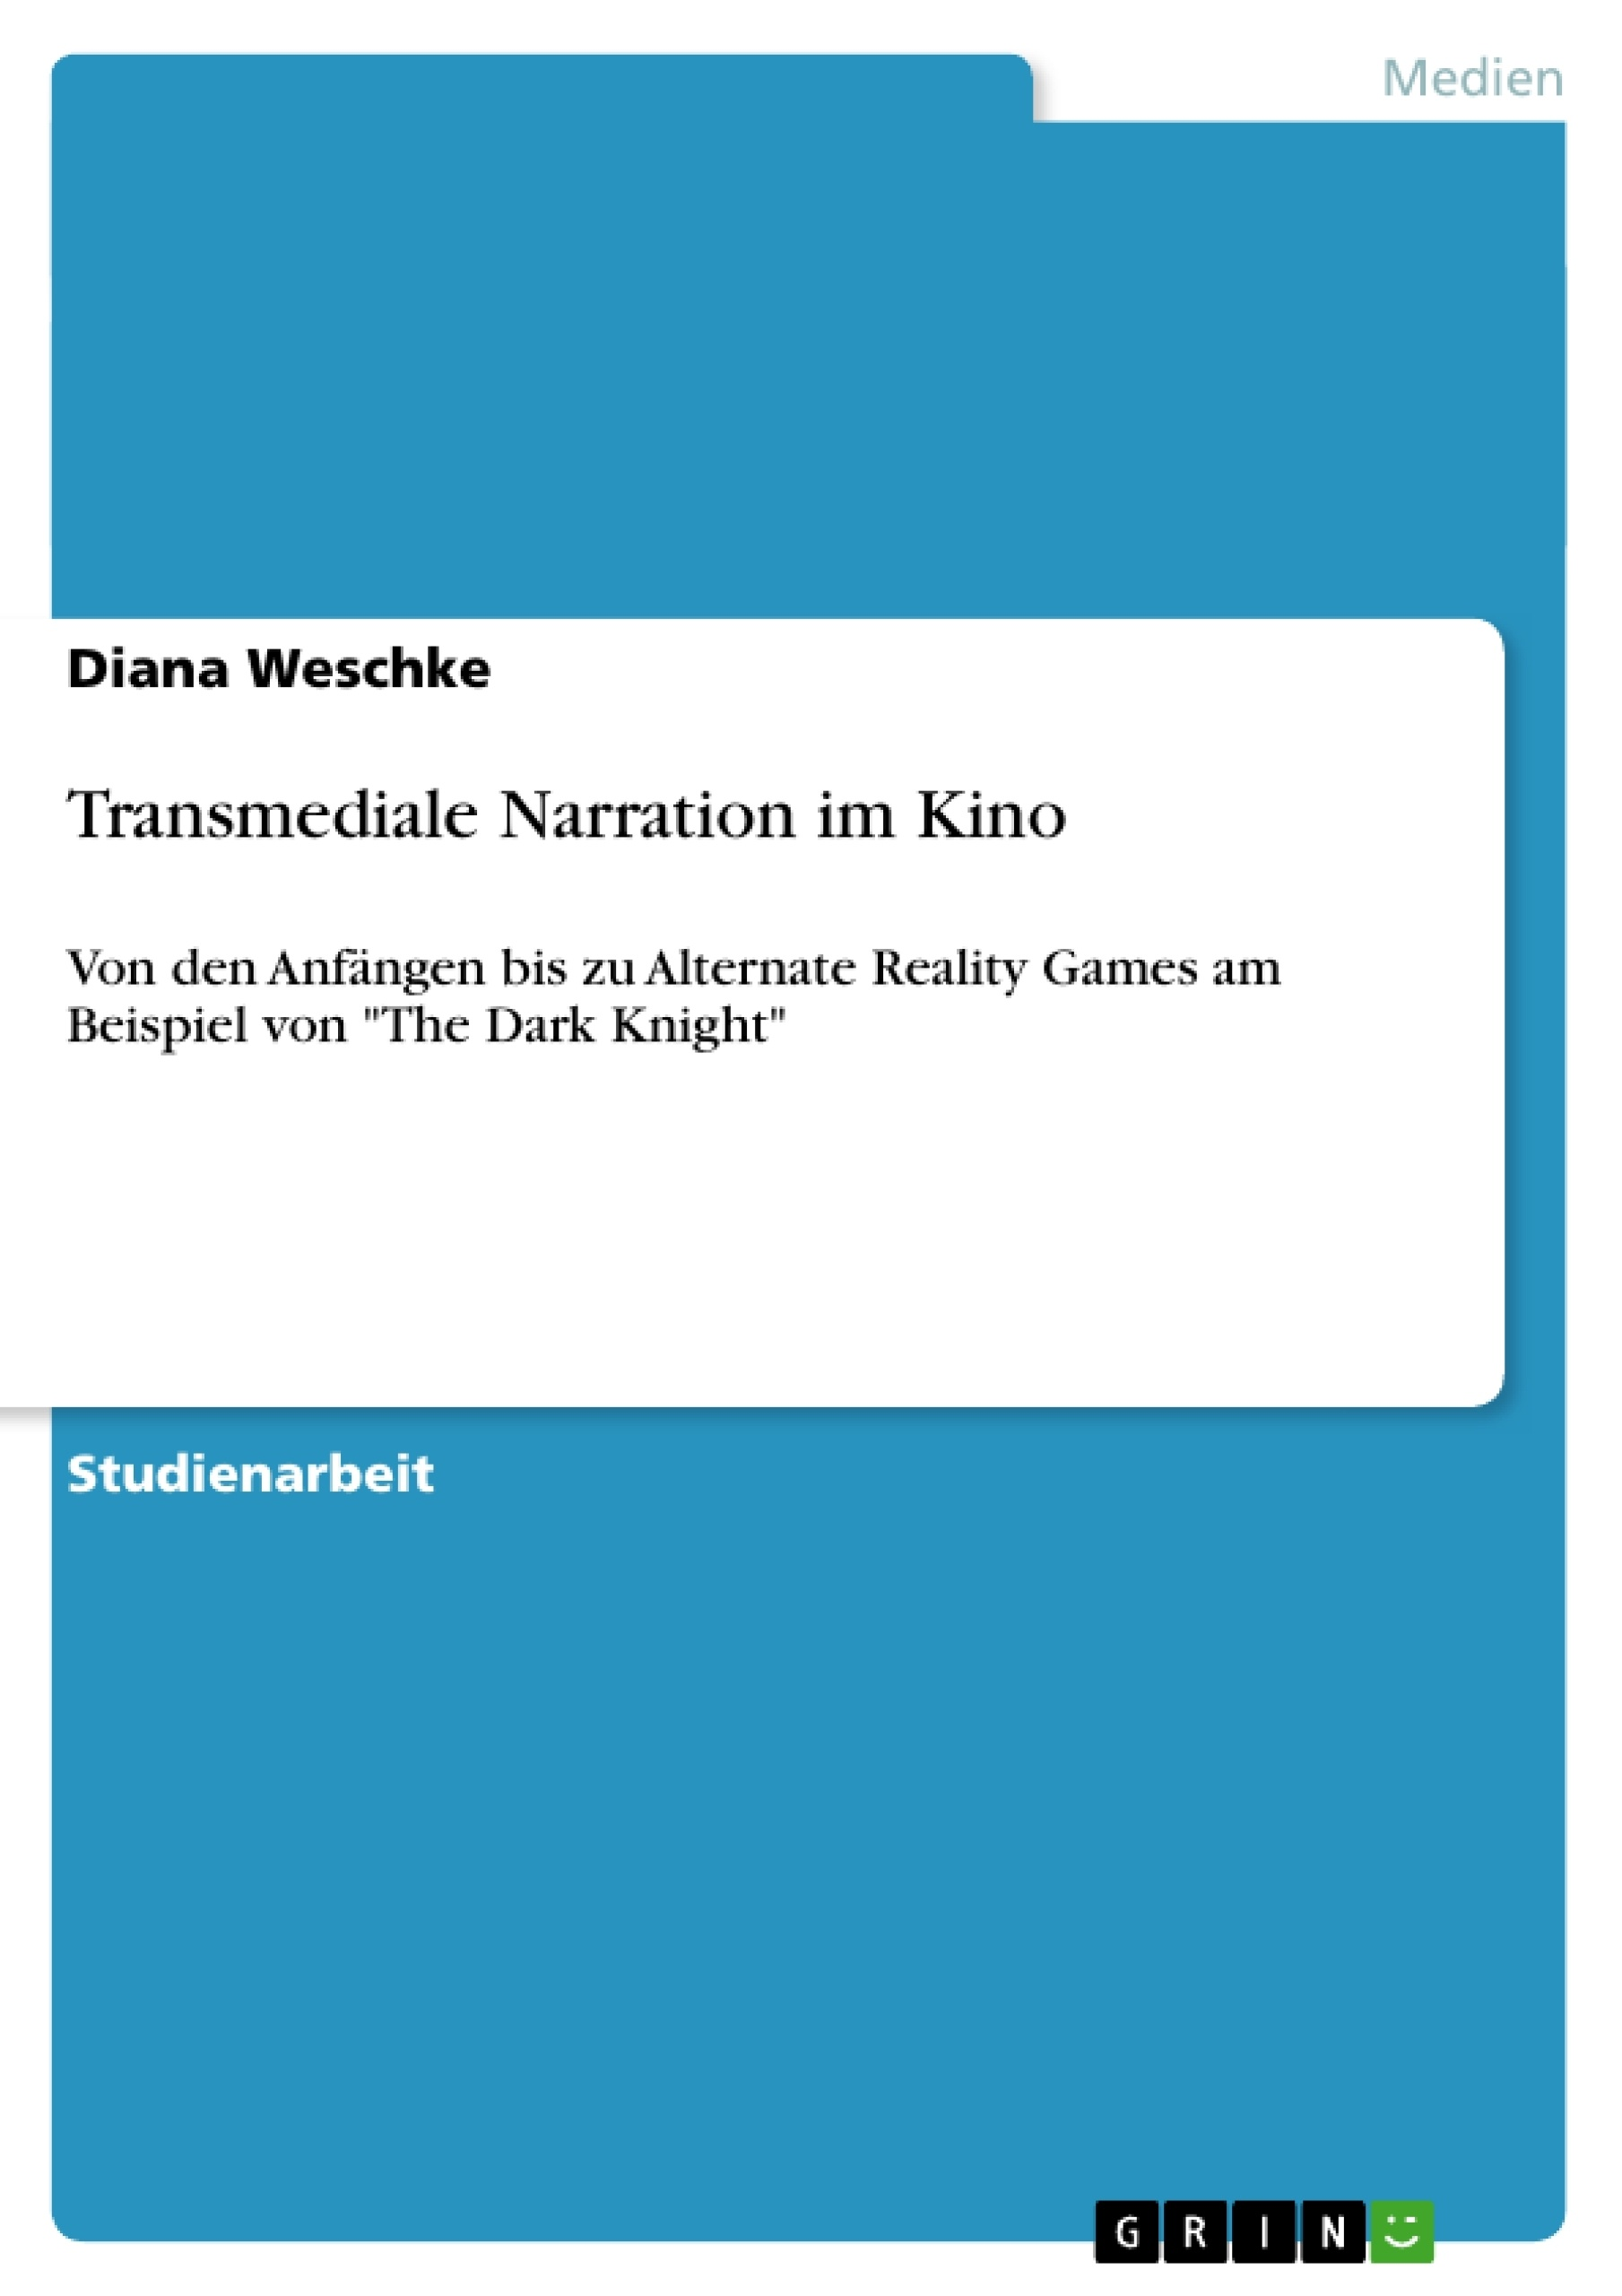 Titel: Transmediale Narration im Kino